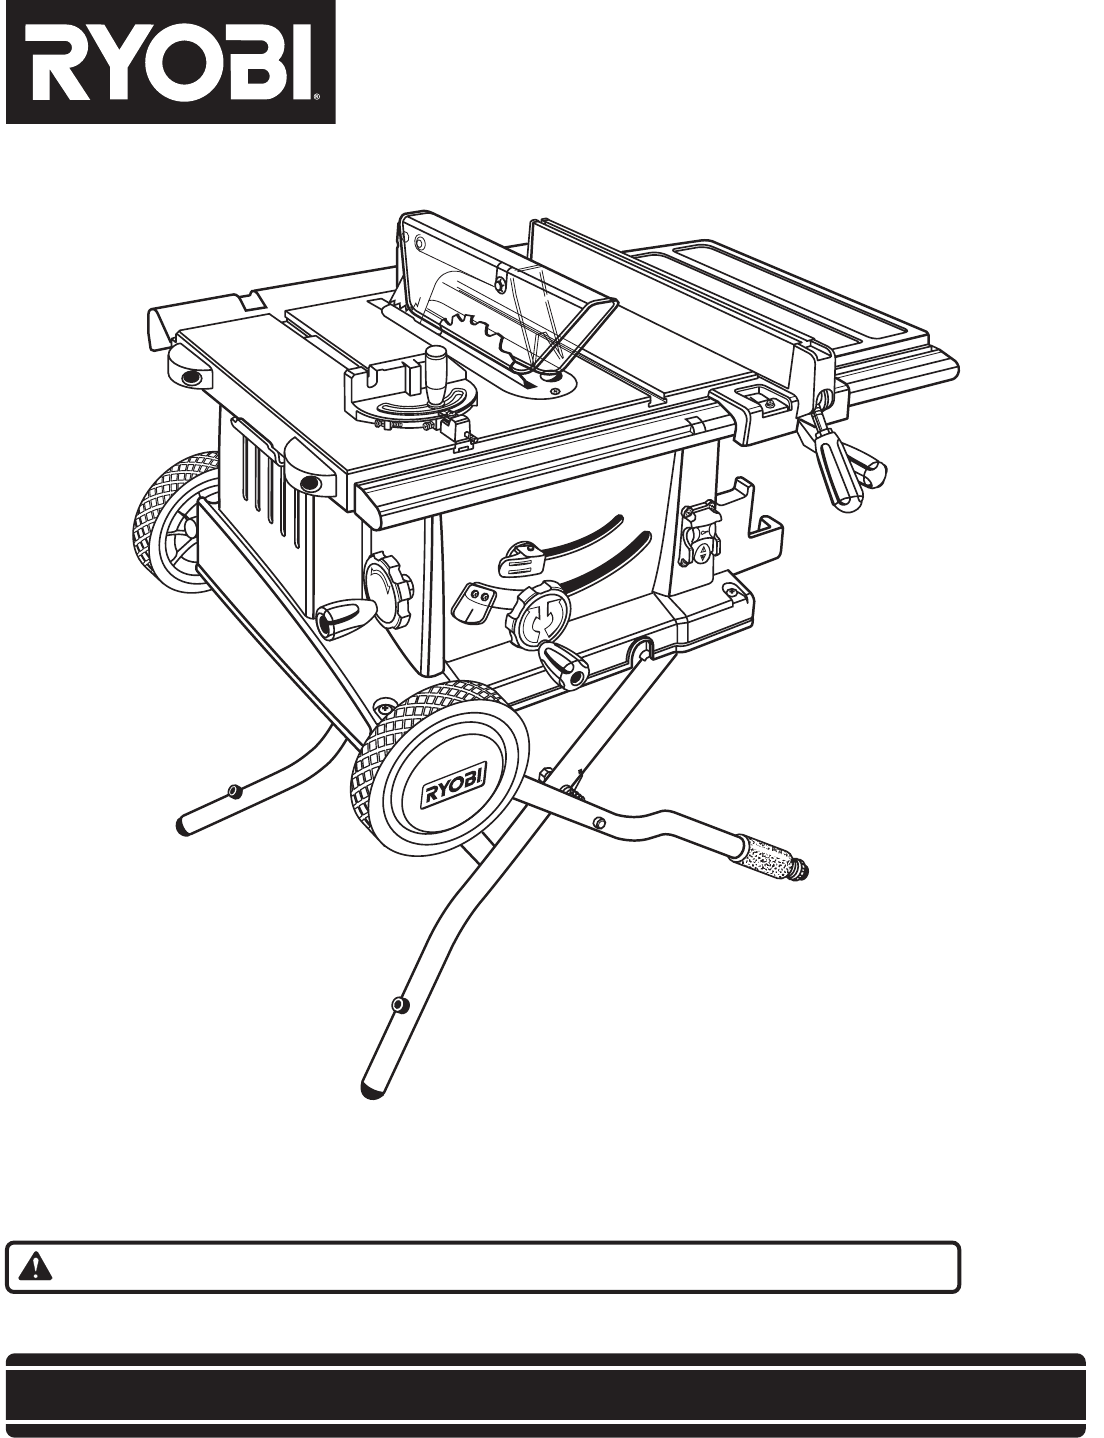 hight resolution of  ryobi bts20r manual on ryobi bts15 rip fence used ridgid table saw ryobi bts15 ryobi bts table saw wiring diagram